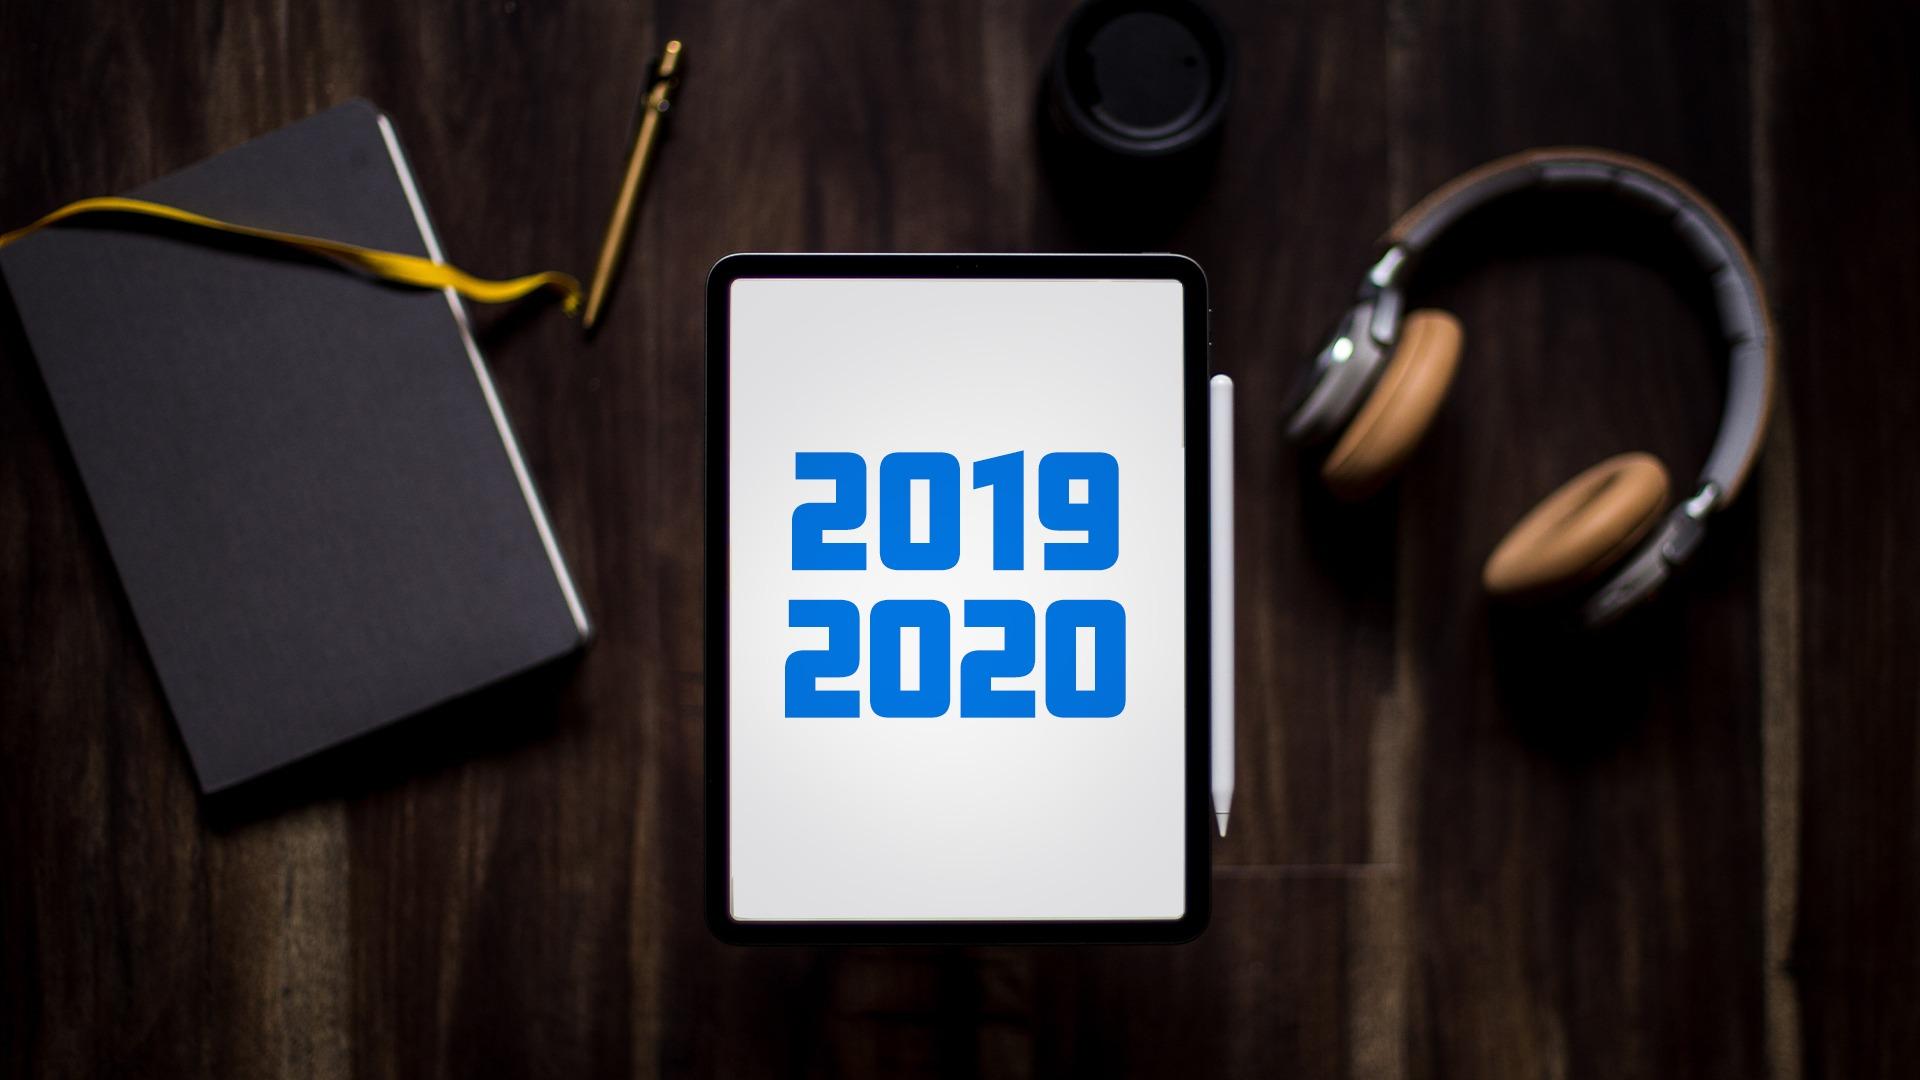 2019 e 2020